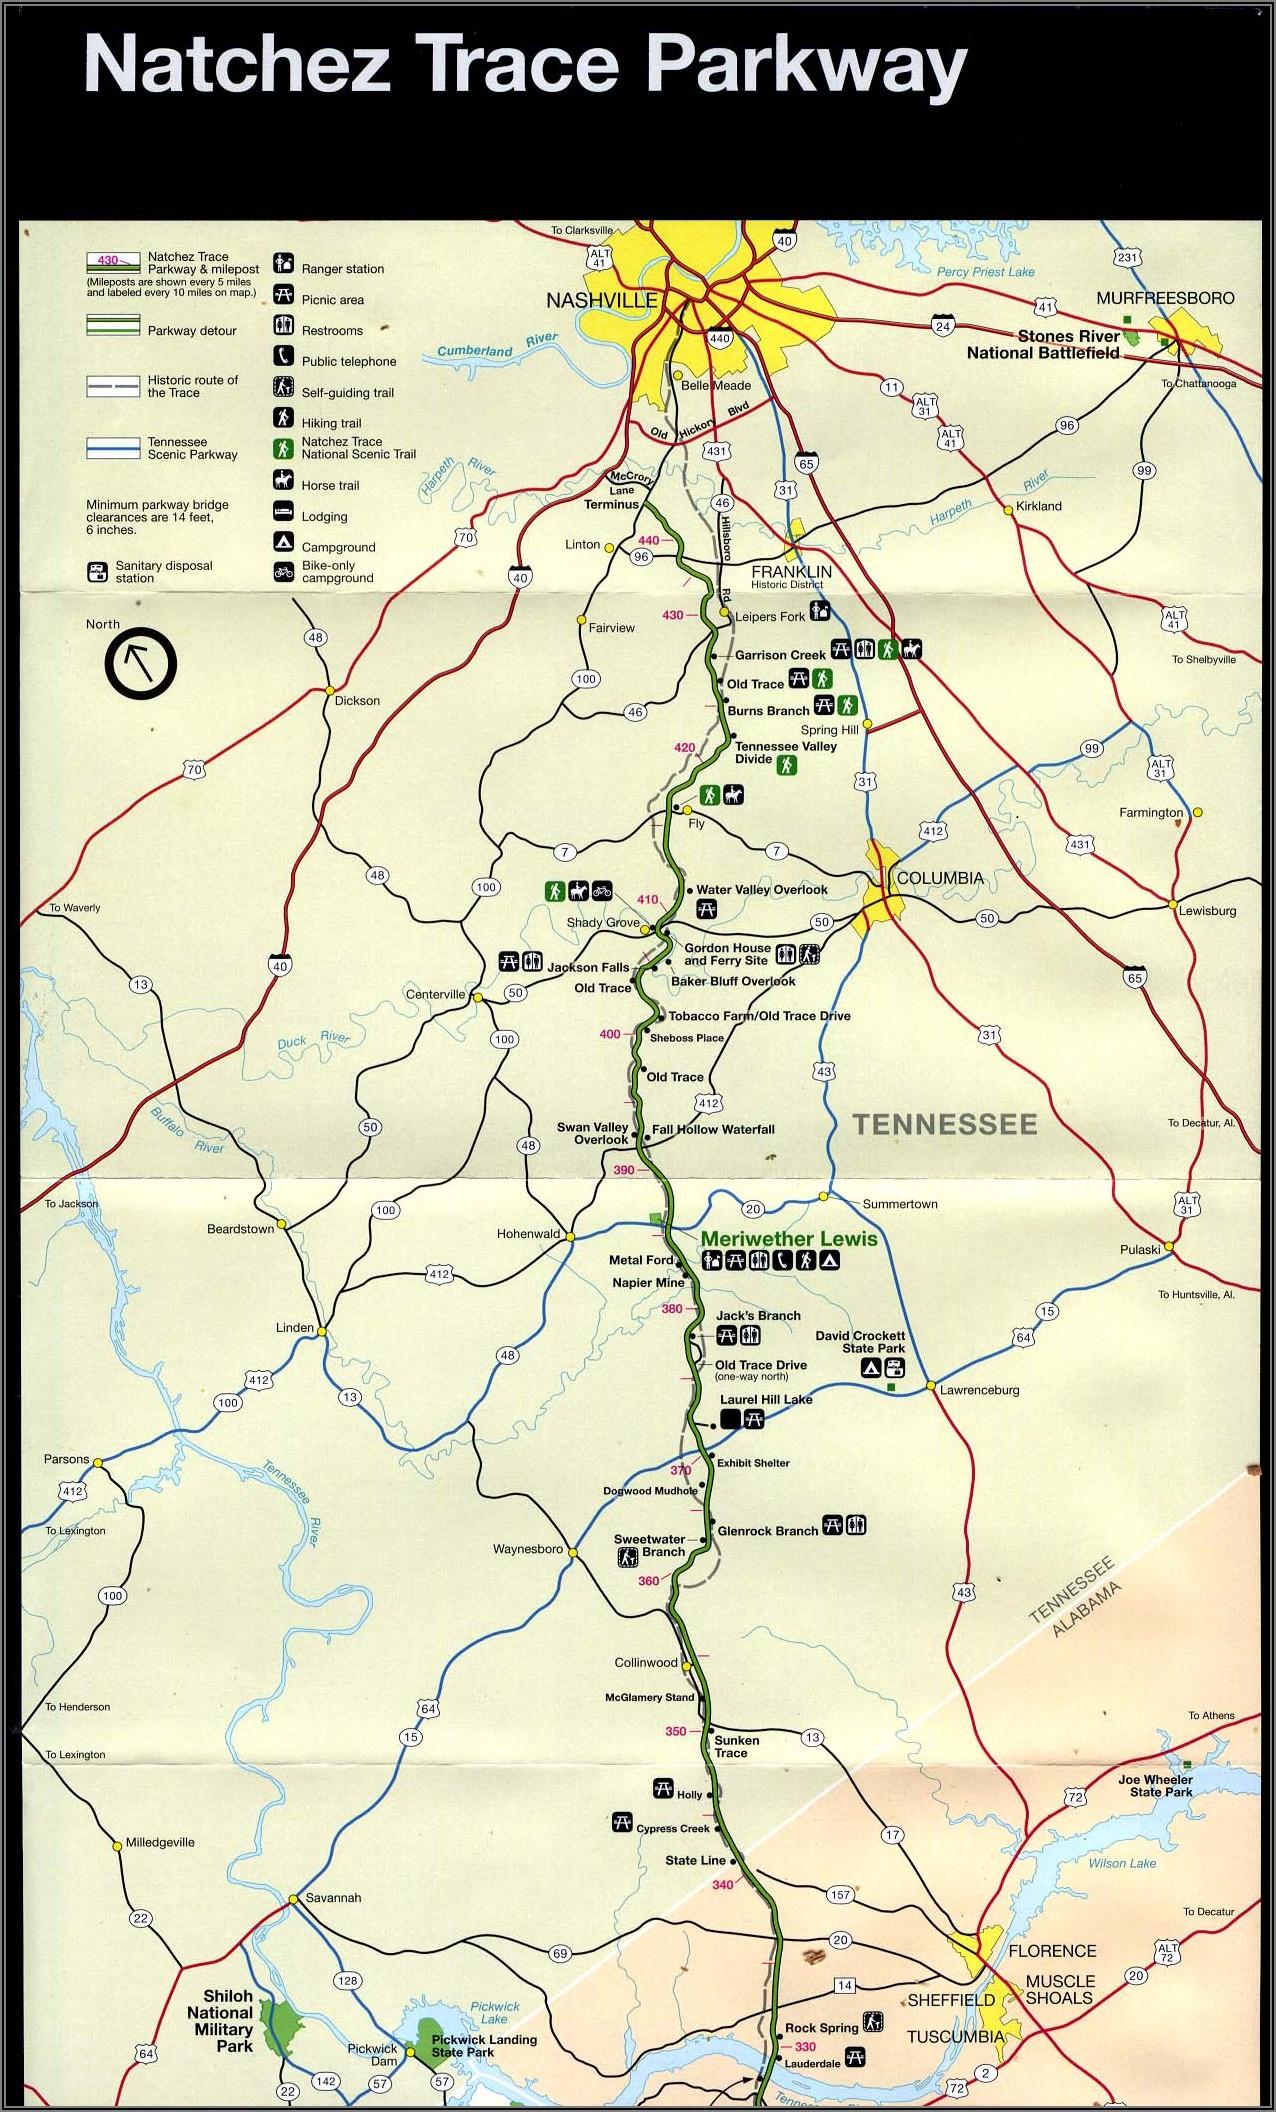 Natchez Trace Parkway Elevation Map